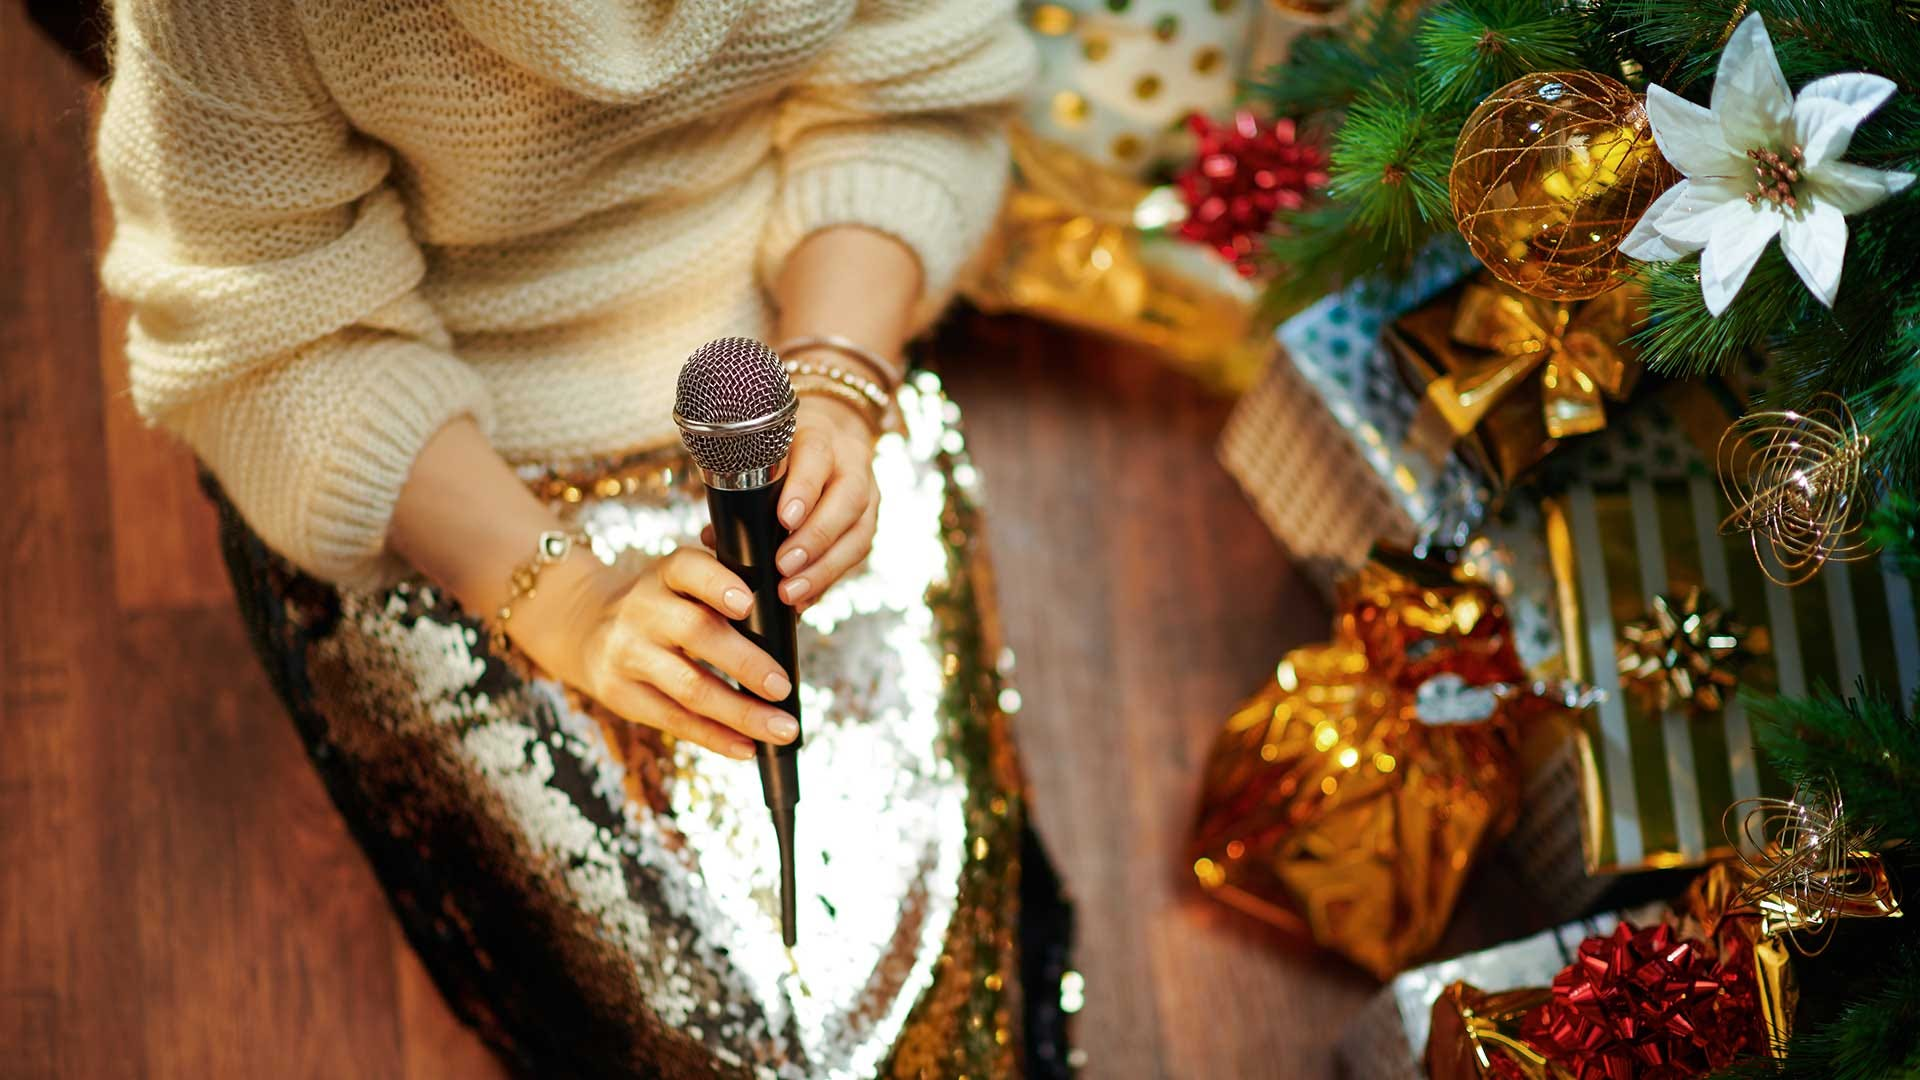 A woman sitting beside a Christmas tree, singing karaoke.